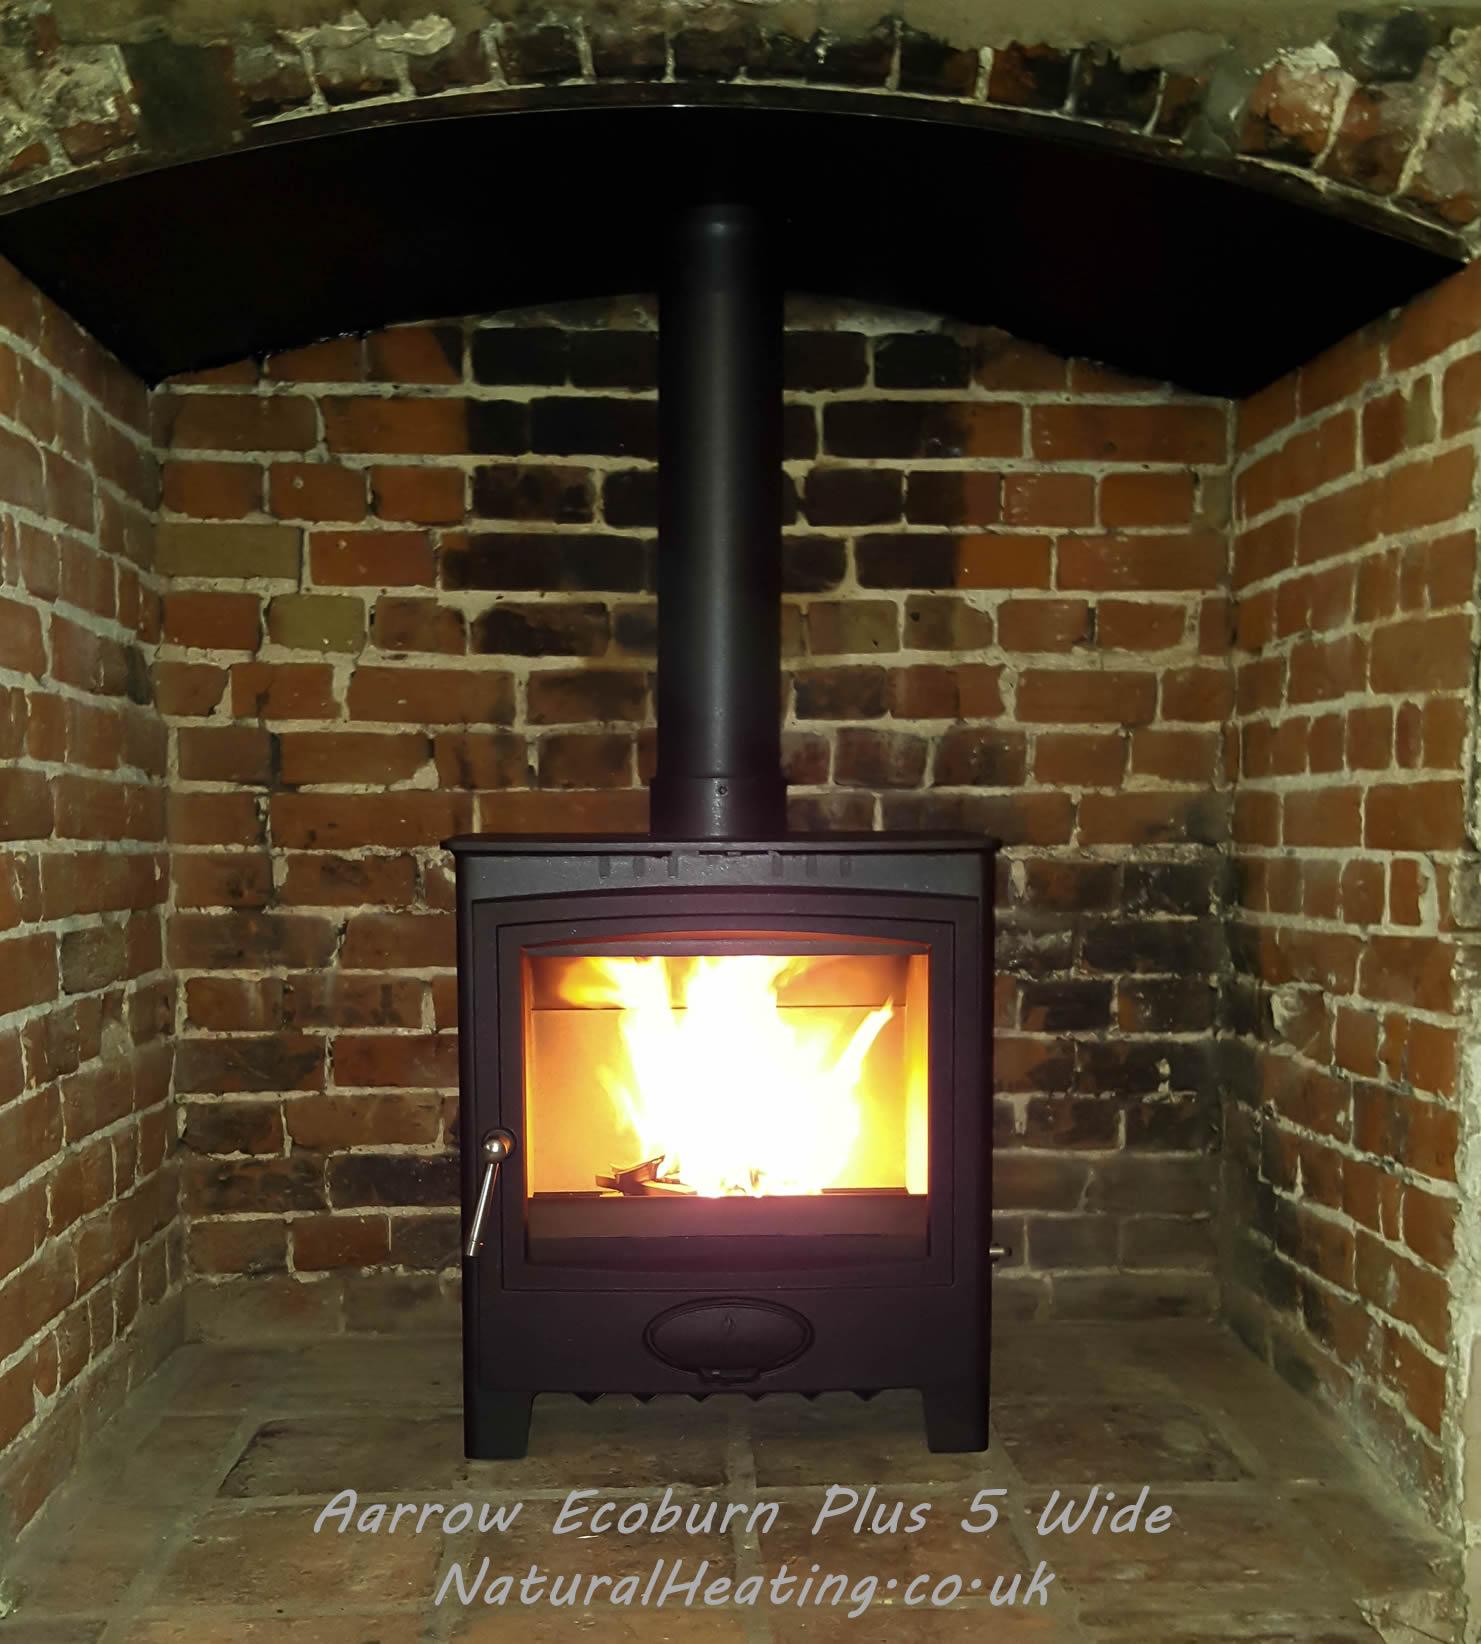 Aarrow Ecoburn Plus 5 Wide Multi Fuel And Wood Burning